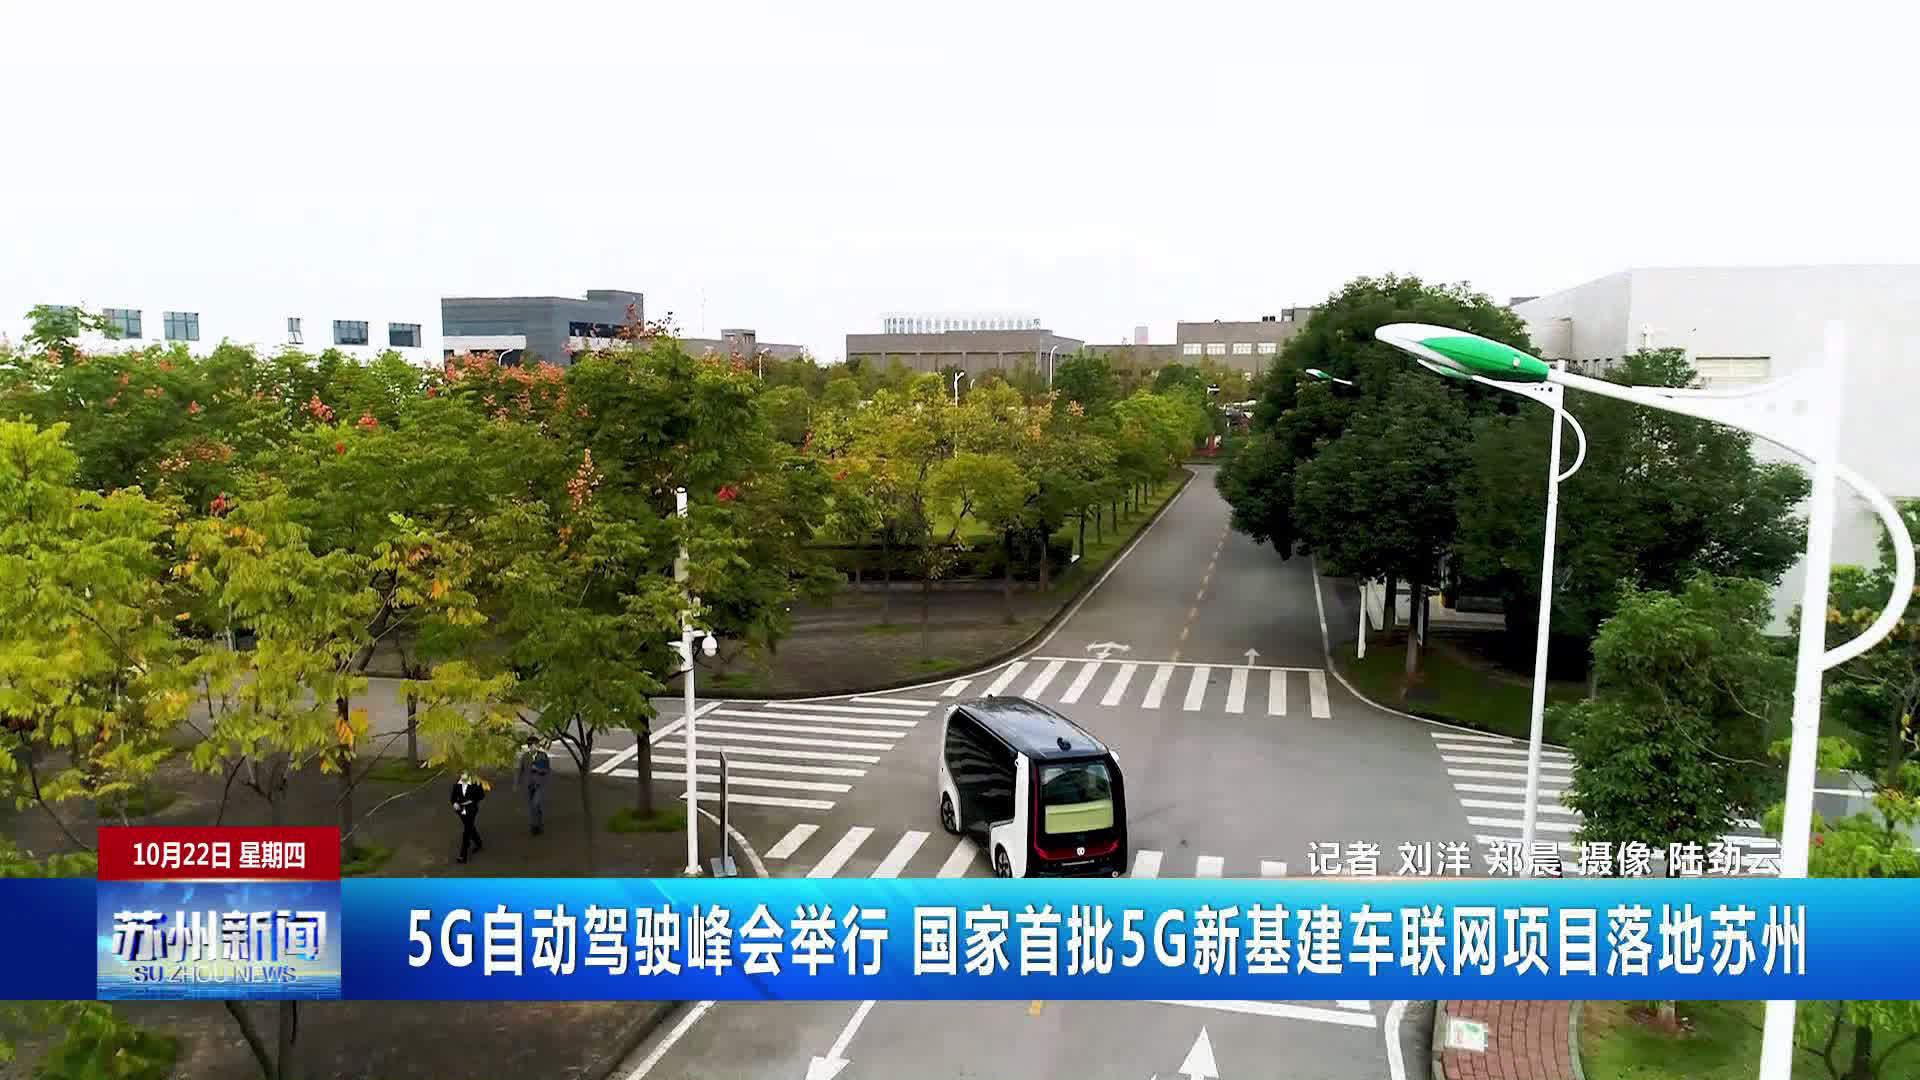 5G自动驾驶峰会举行 国家首批5G新基建车联网项目落地苏州